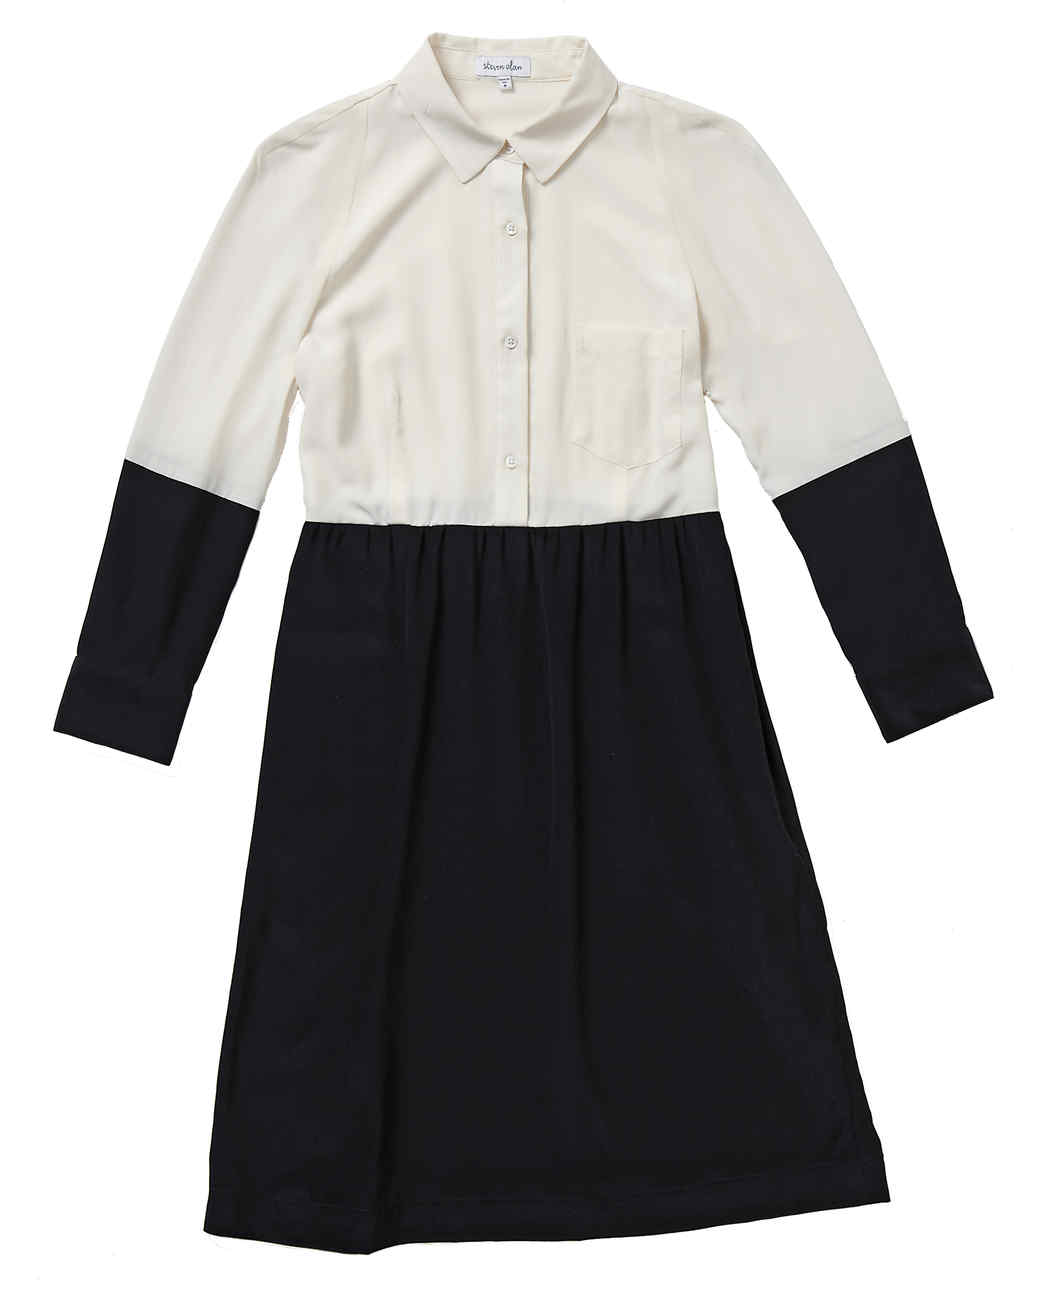 stevenalan-bw-dress-mld110379.jpg